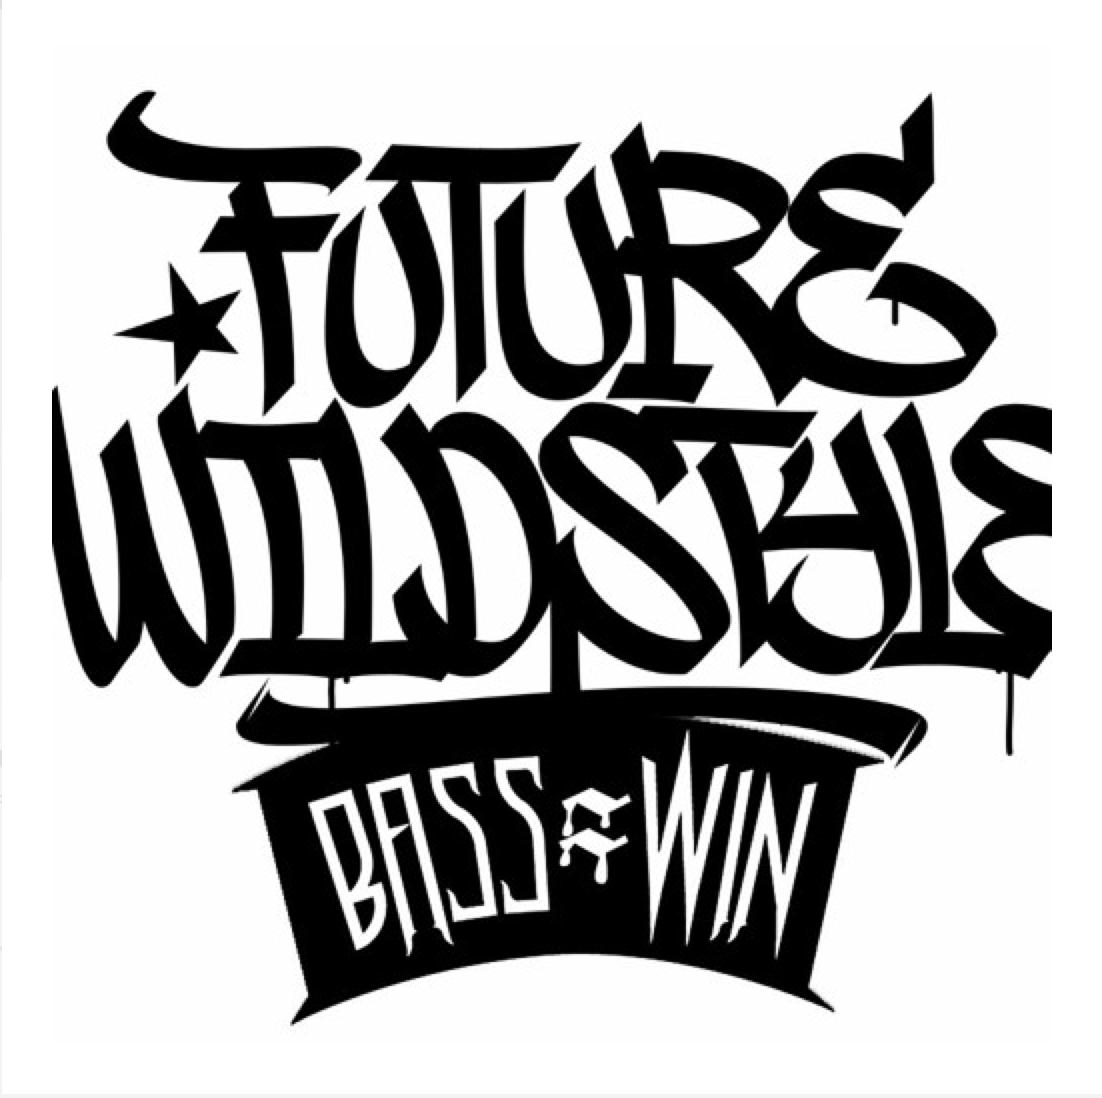 Future Wildstyle - Ultrafunkula EP [Bass=Win]